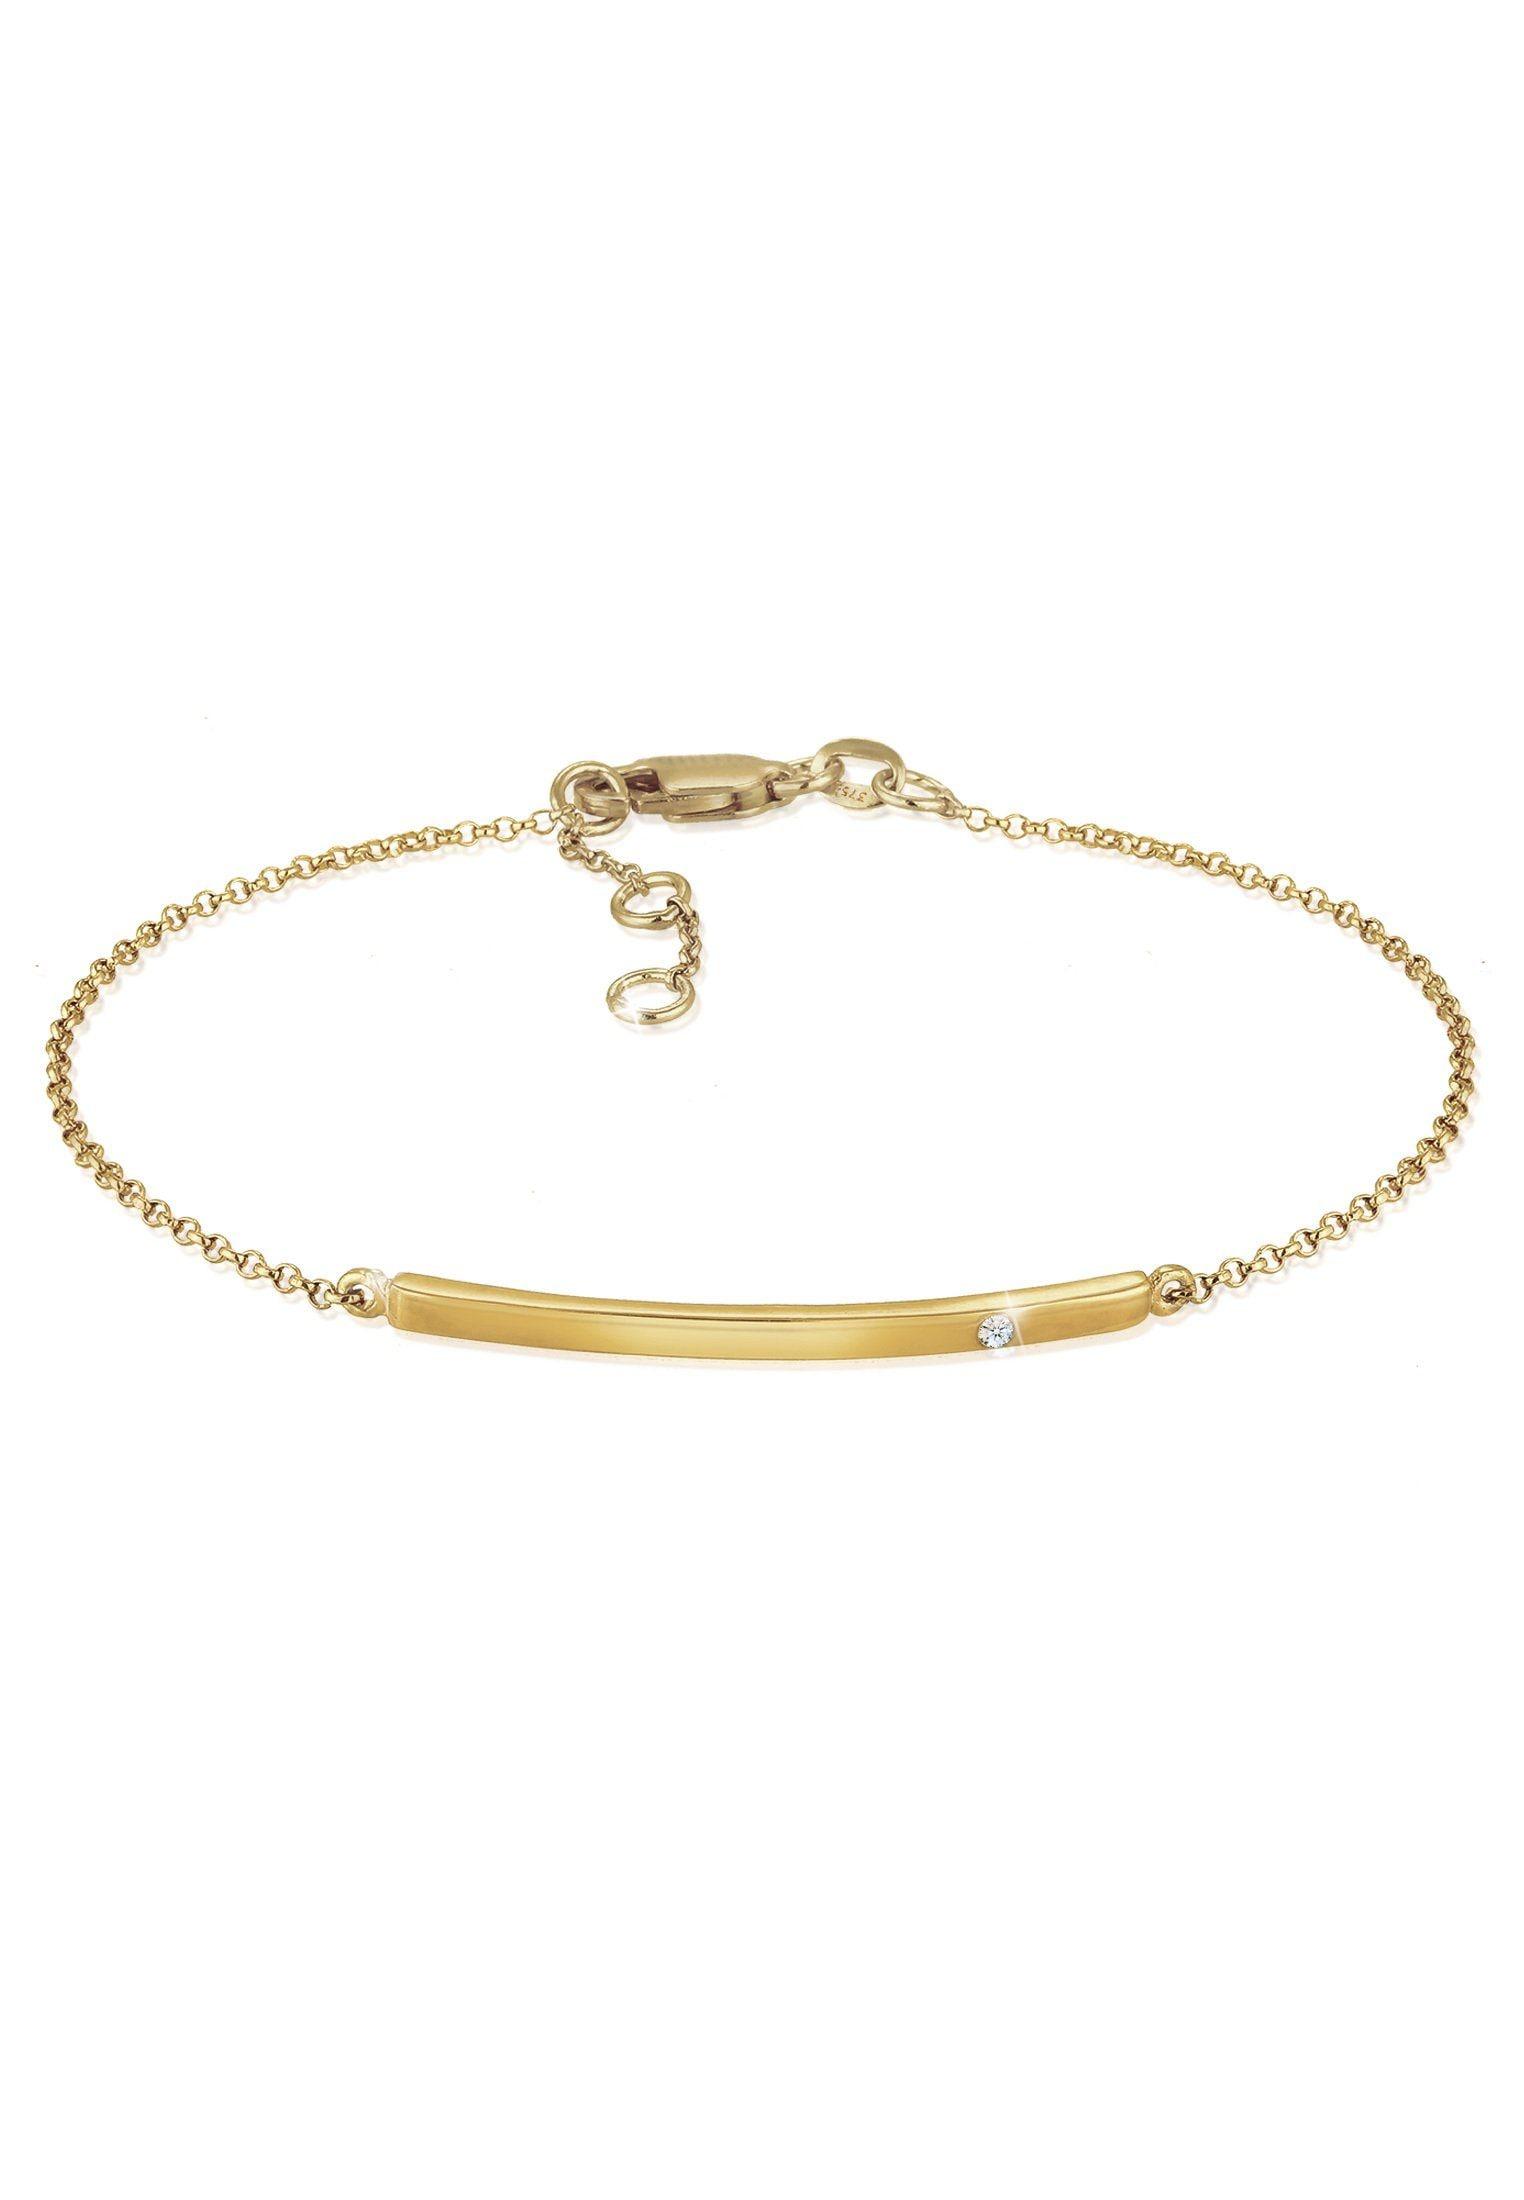 Diamore Armband Erbskette Geo Stab Diamant (002 ct) 375 Gelbgold | Schmuck > Armbänder > Goldarmbänder | Goldfarben | Diamore